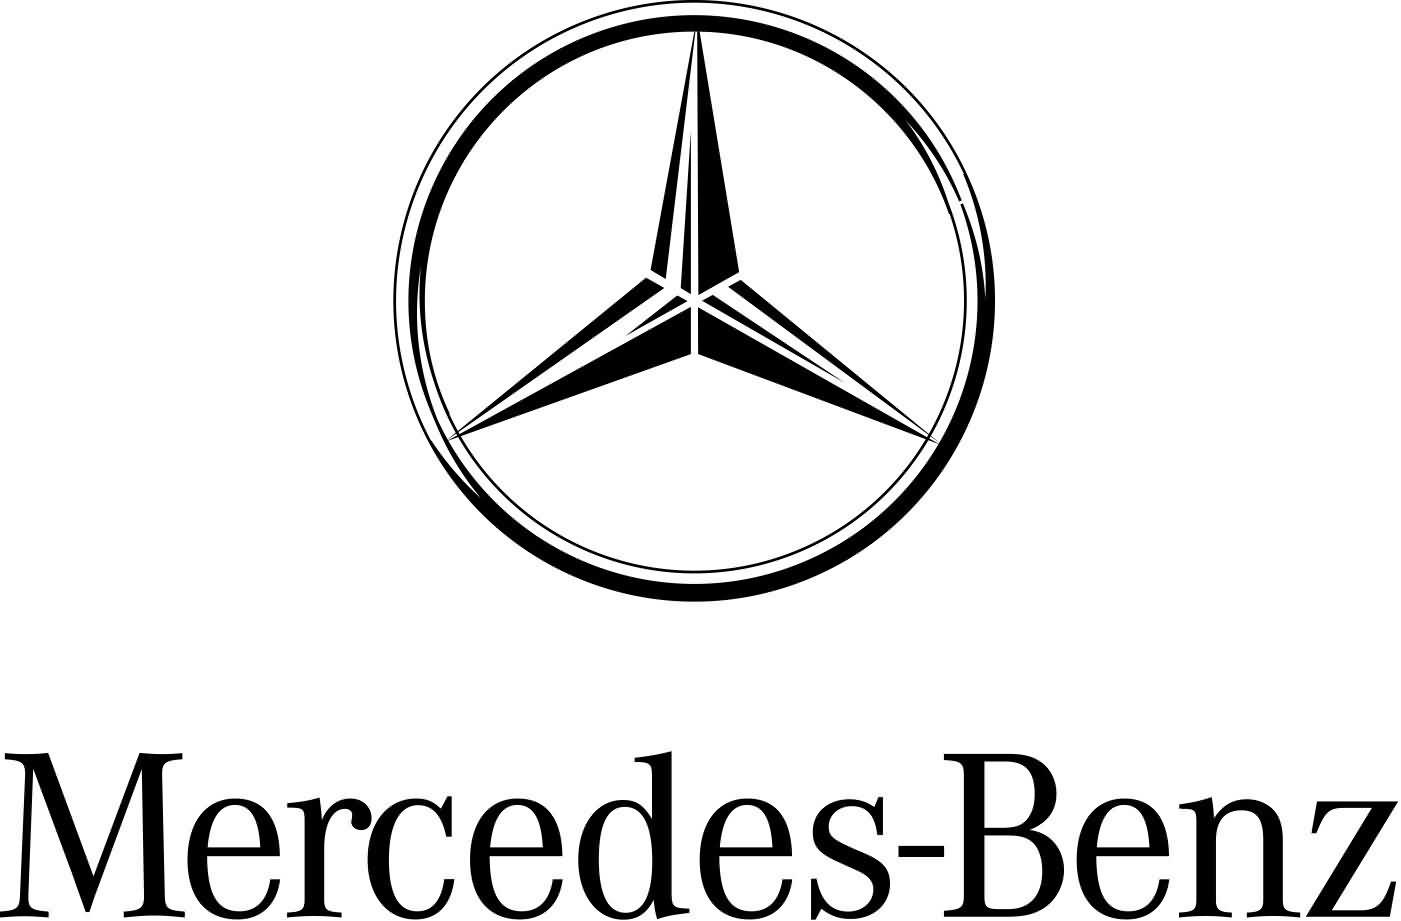 Mercedes-Benz-logo-3.jpg